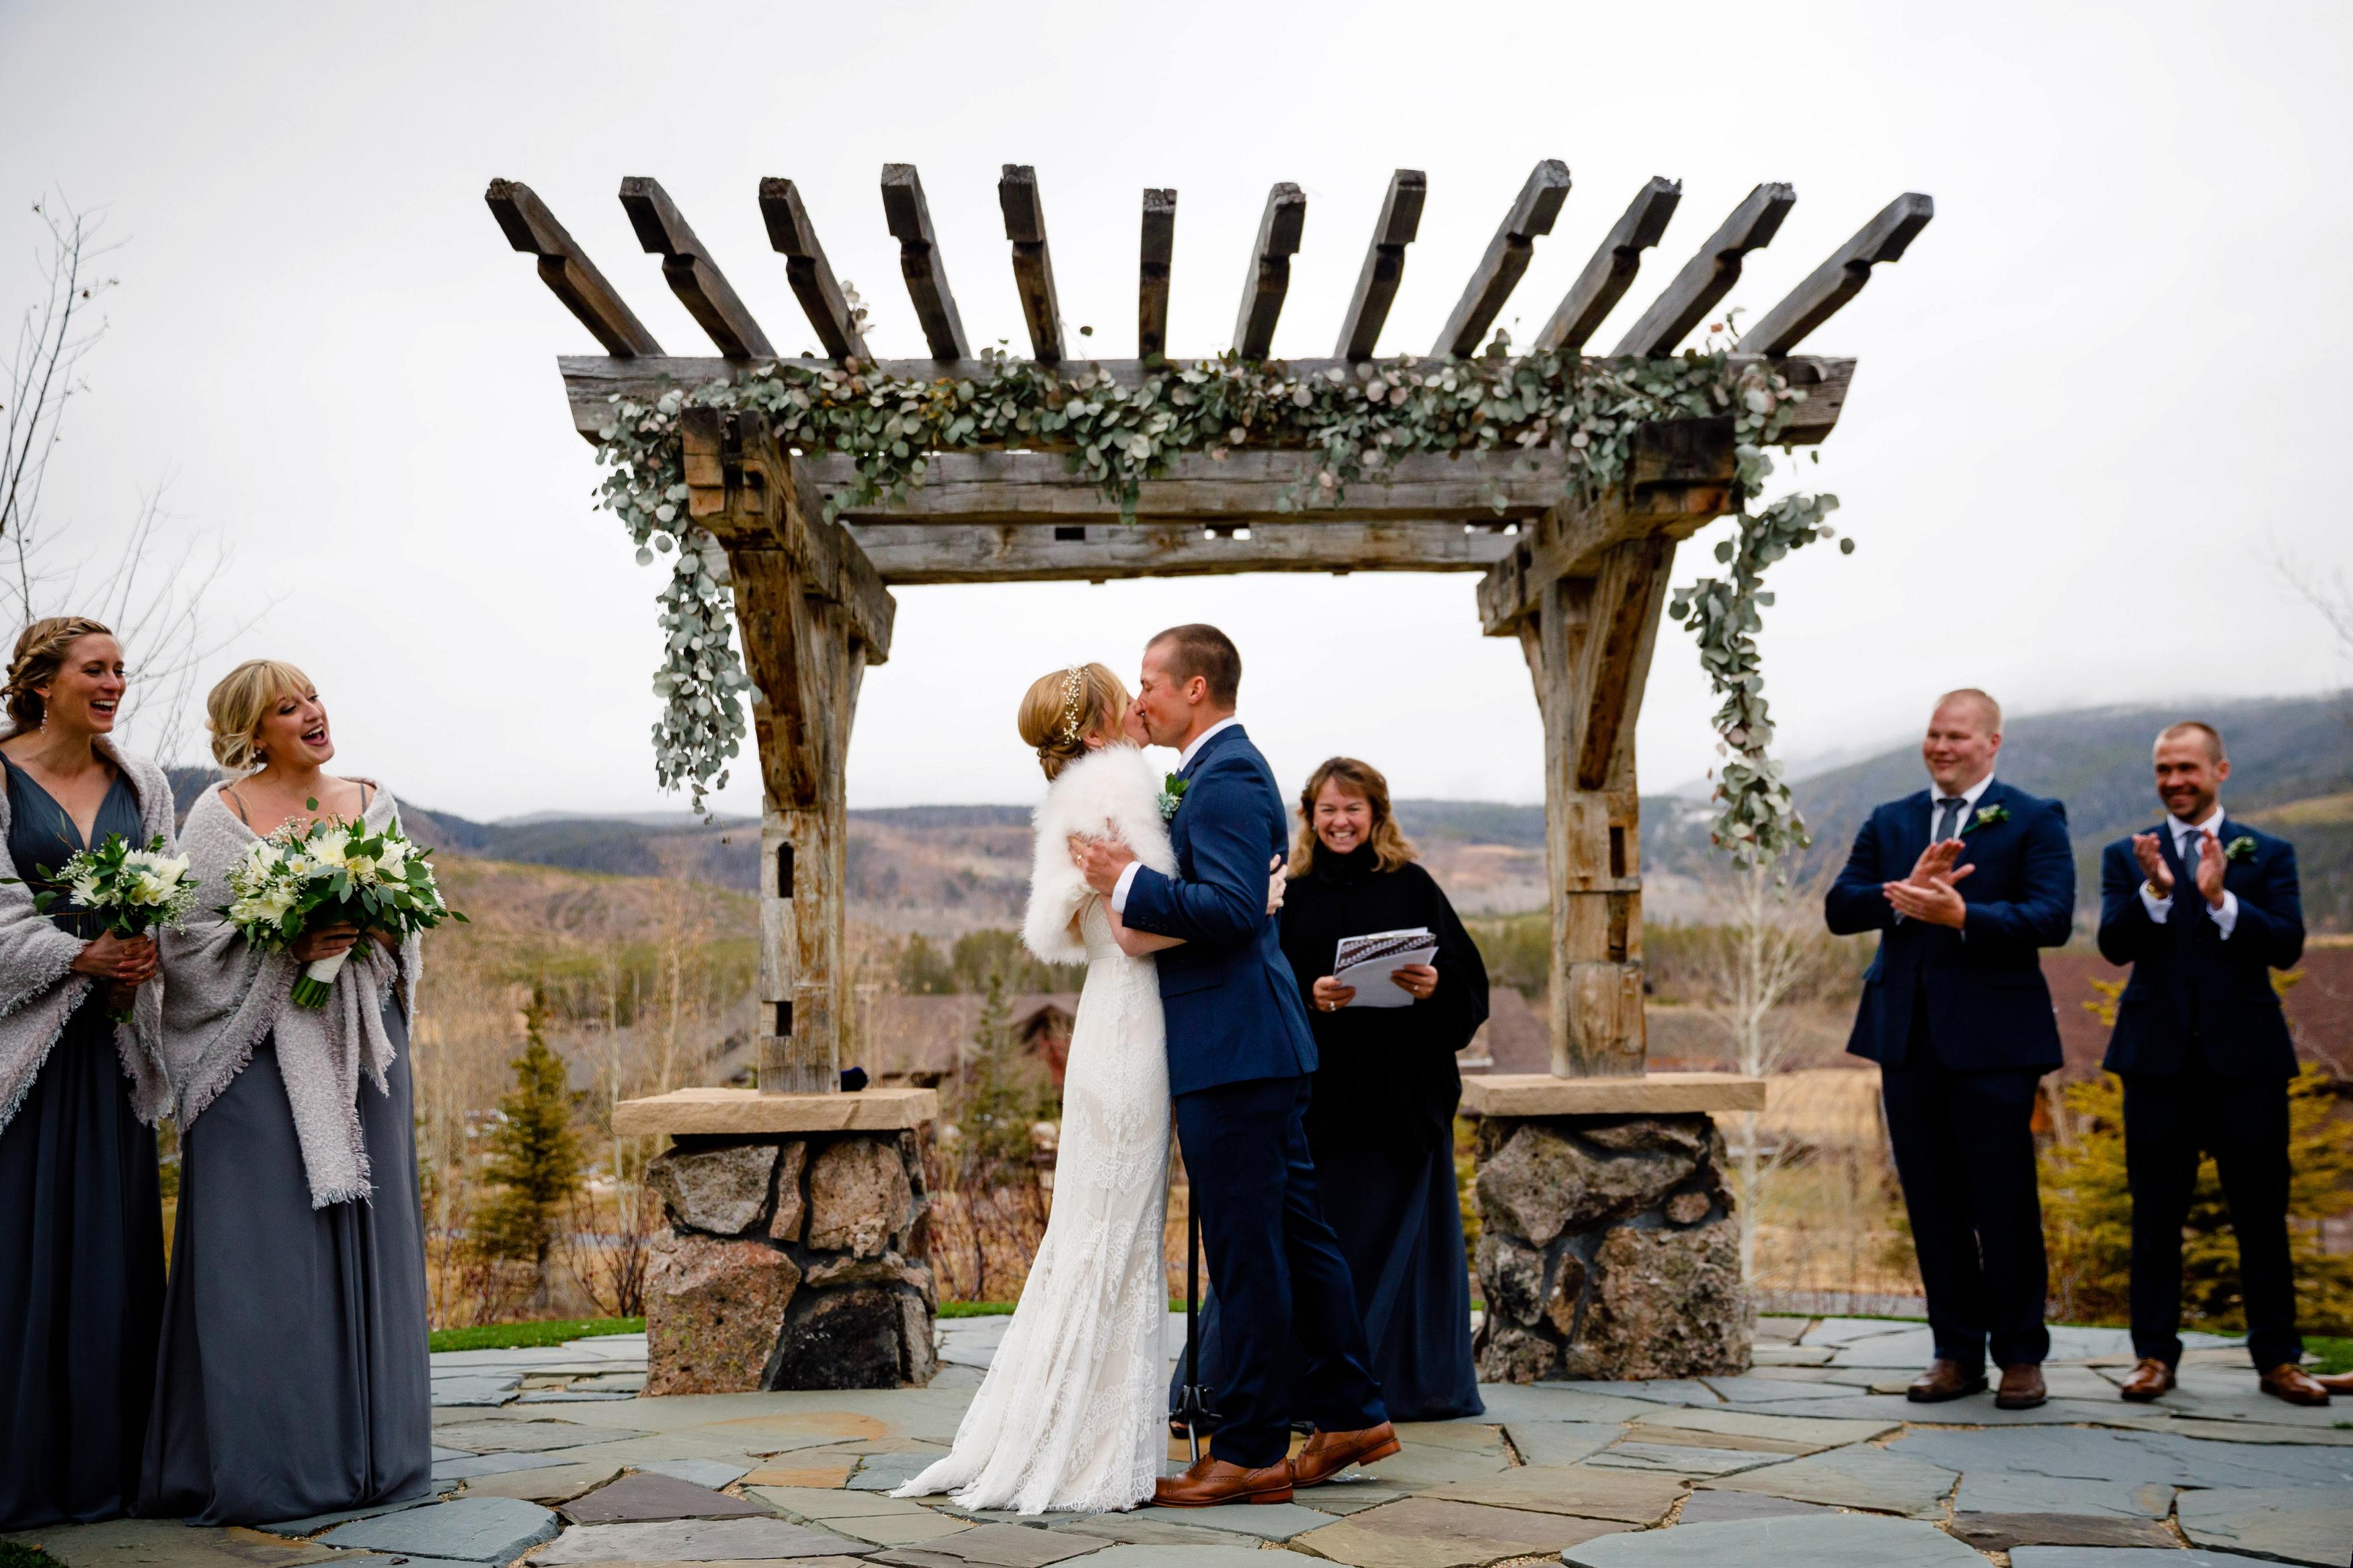 Dave & Audrey's Beautiful Fall Wedding at Devil's Thumb Ranch